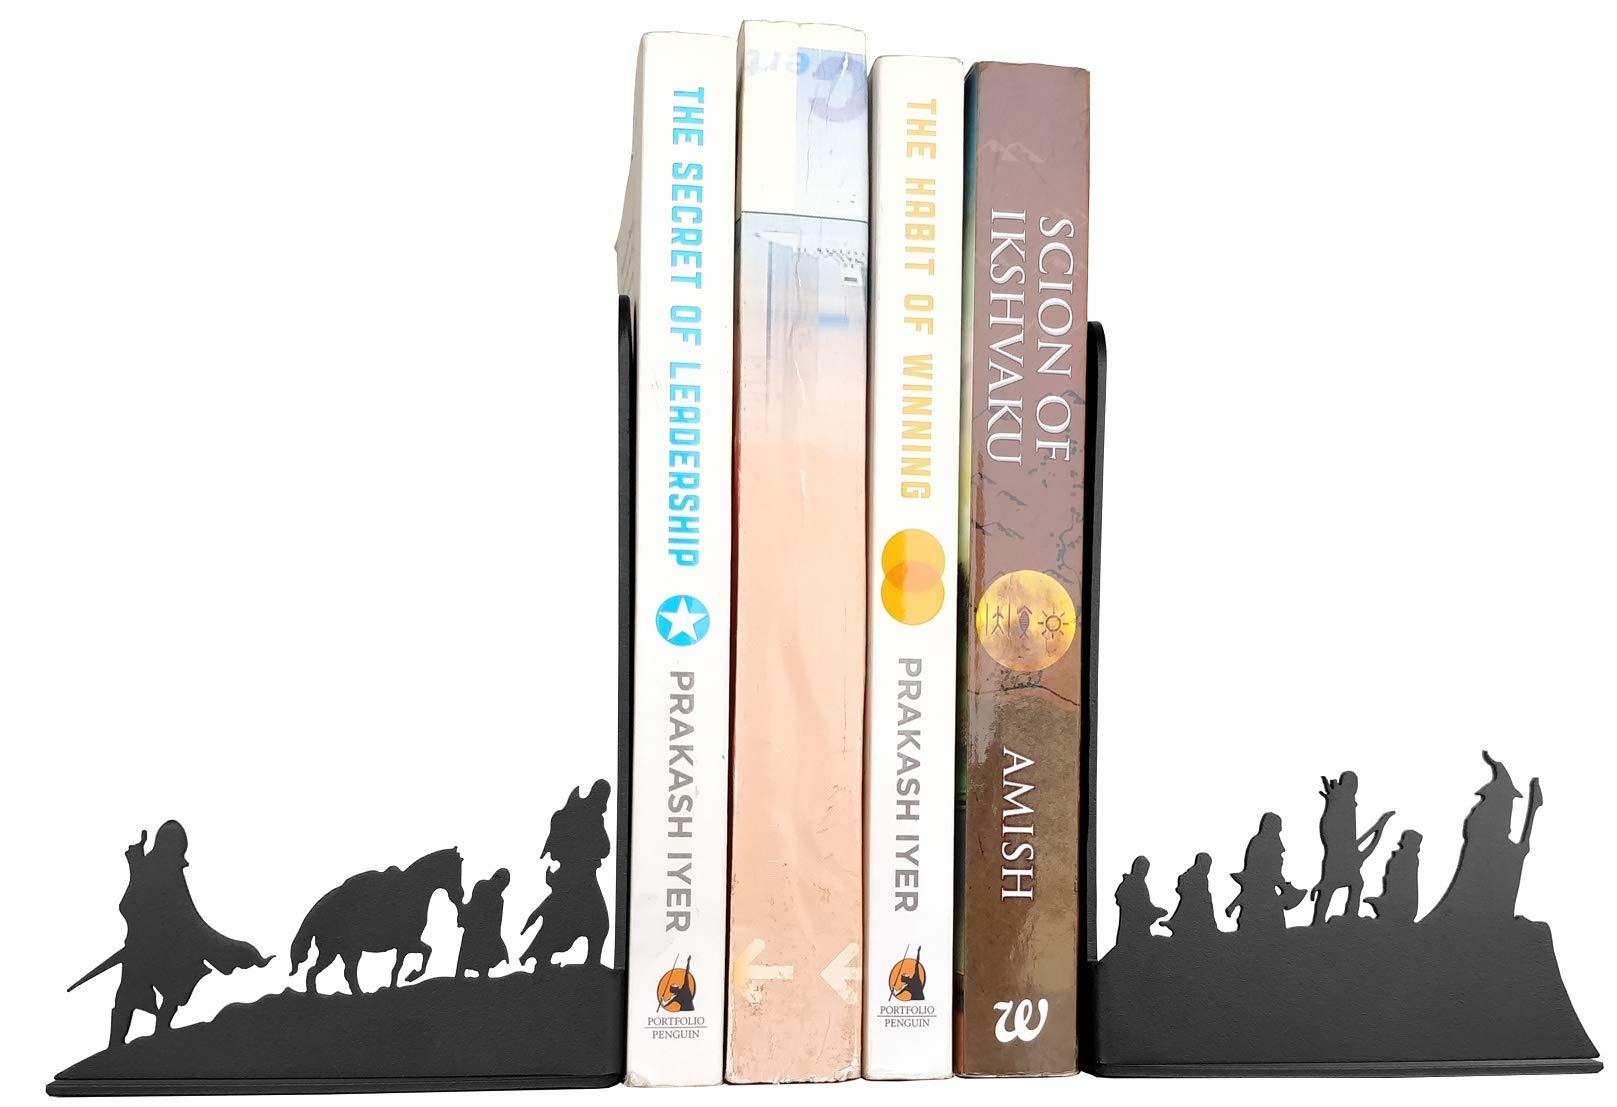 HeavenlyKraft Decorative bookends for Shelves Decorative Metal Bookend, Non Skid Book End, Book Stopper for Home/Office Decor/Shelves, 5.9 X 3.9 X 3.14 Inch Per Piece